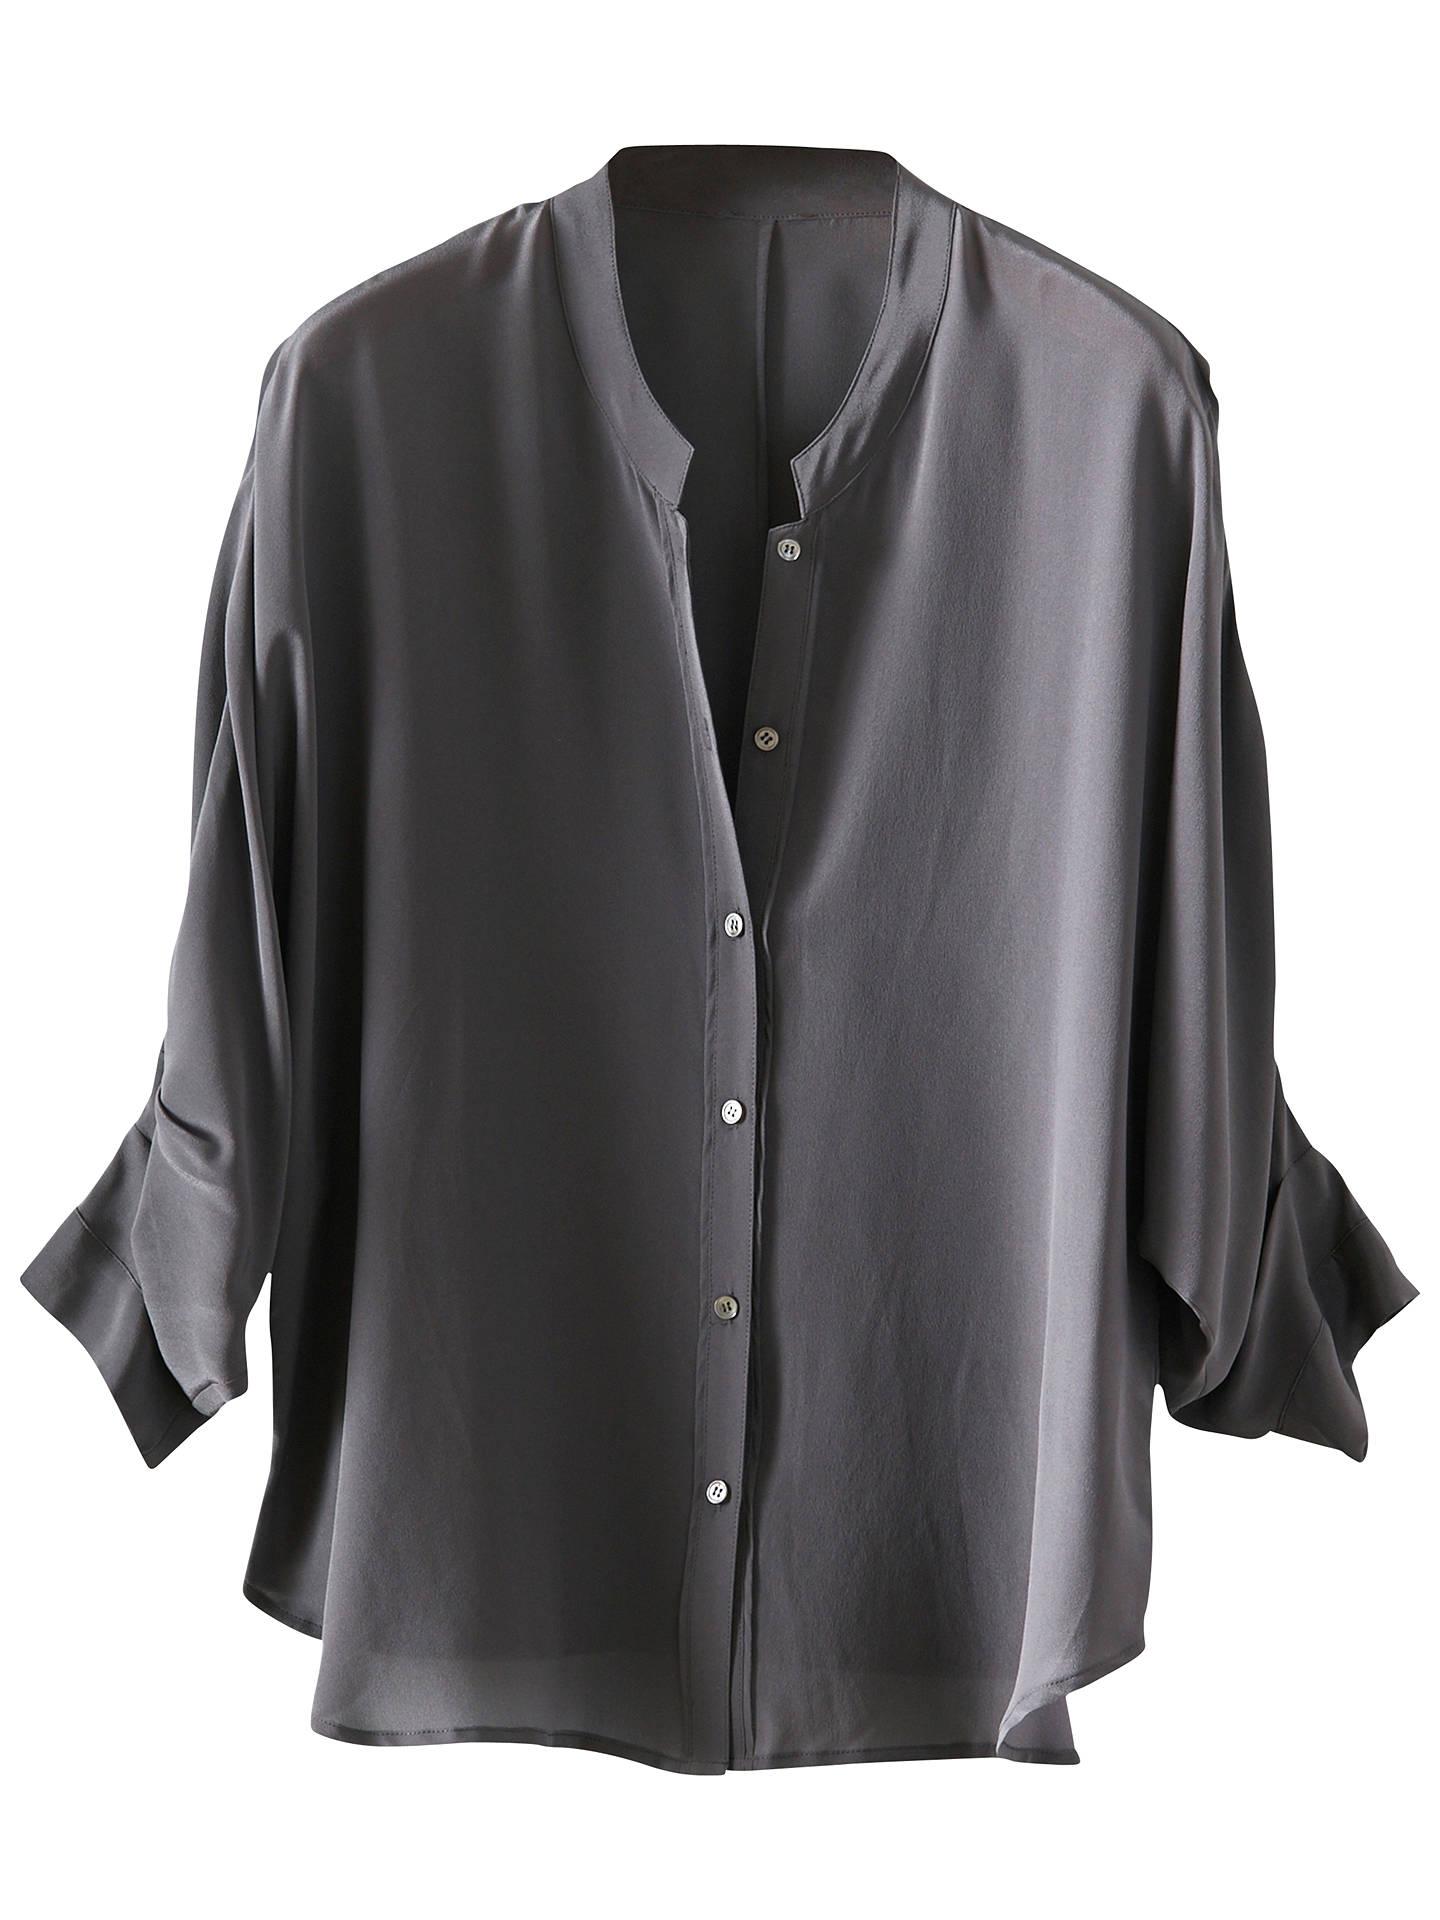 1c356f873bf7eb Buy Poetry Pure Silk Shirt, Dark Grey, 8 Online at johnlewis.com